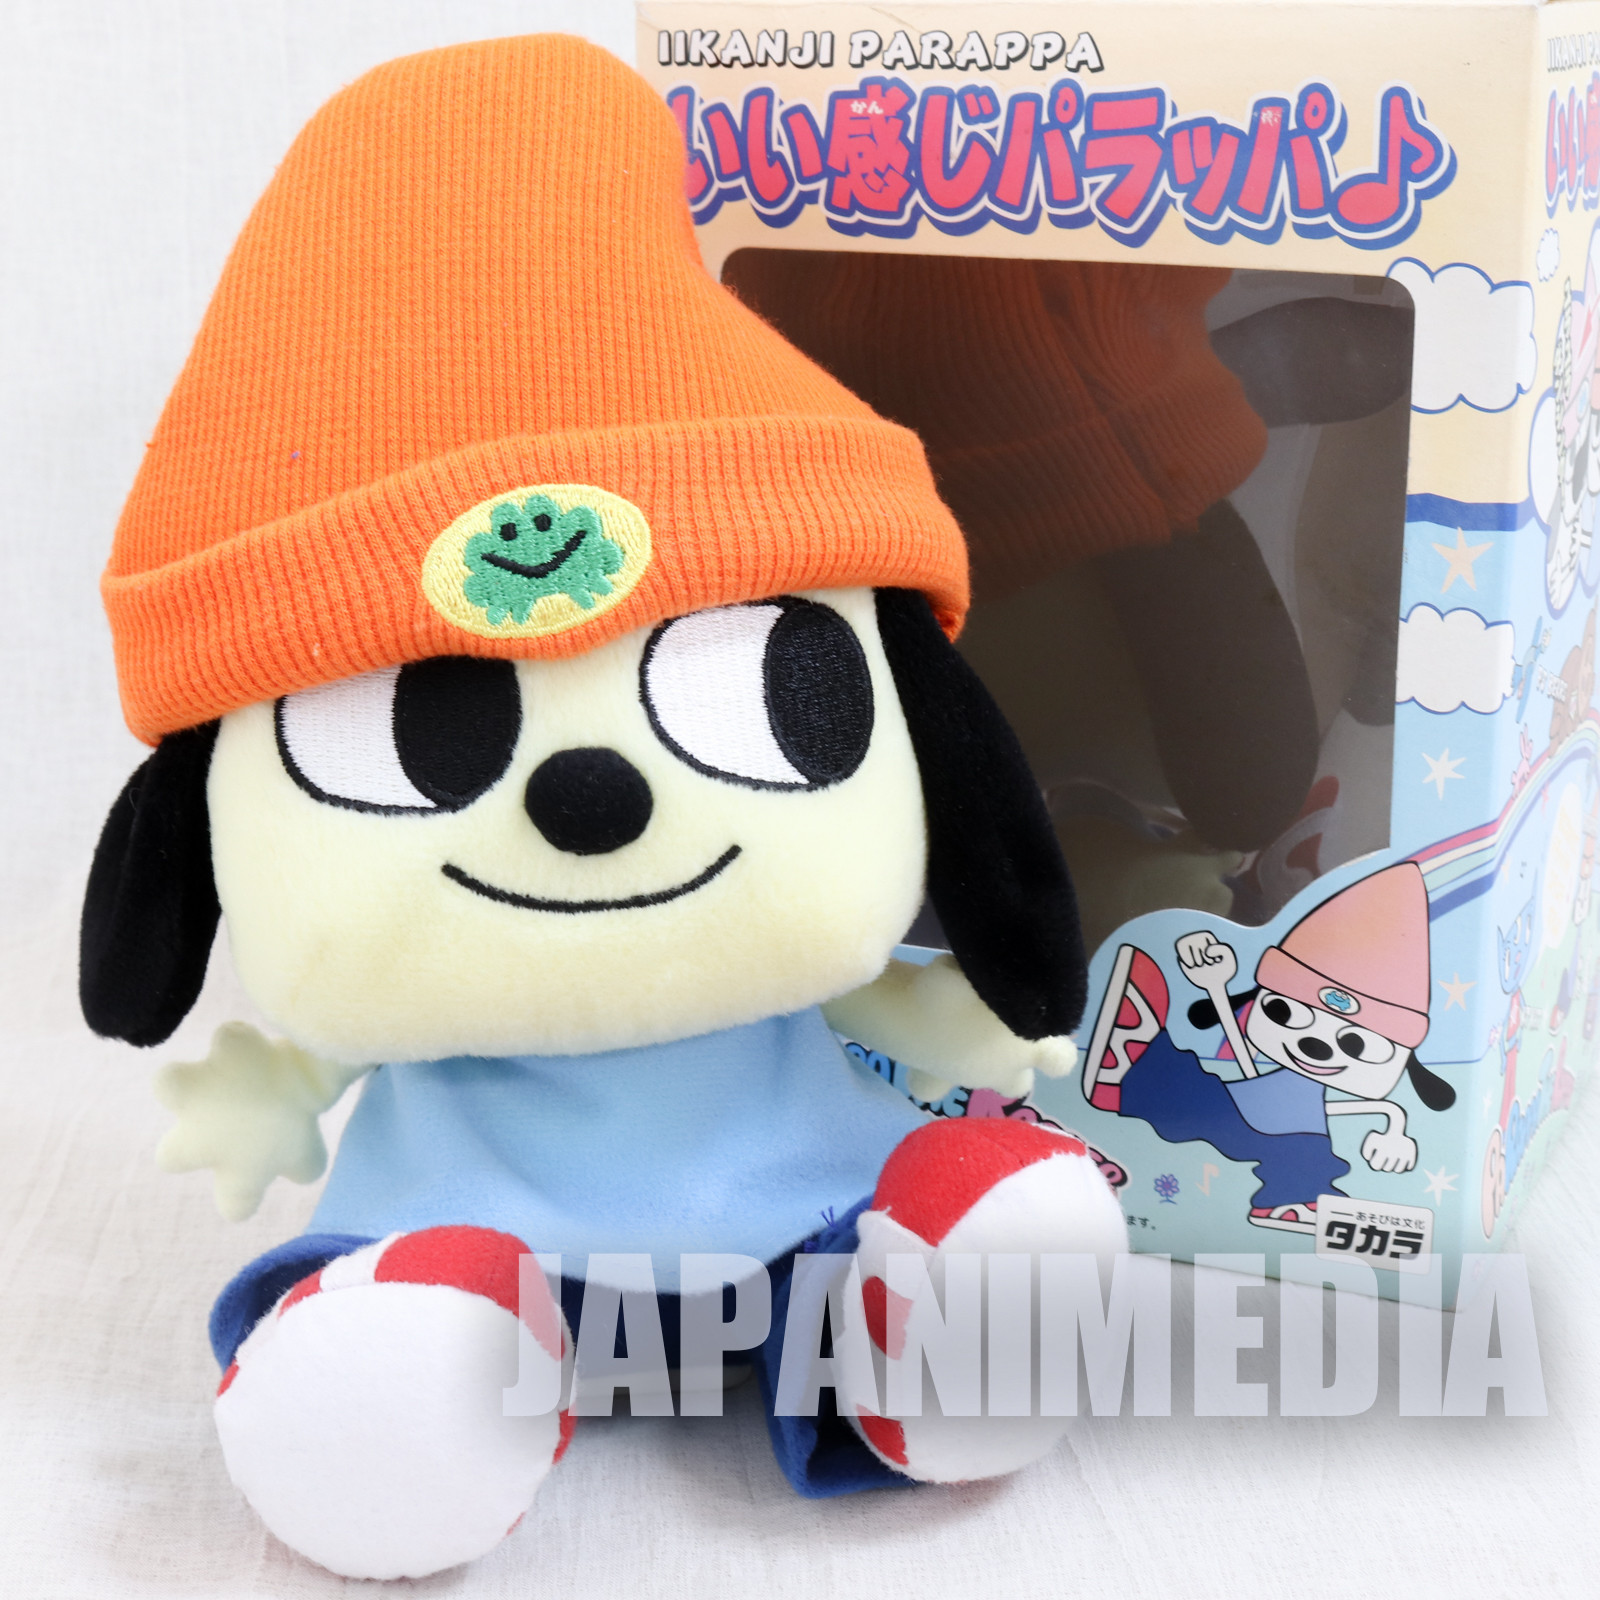 RARE! Parappa The Rapper Iikanji PARAPPA Sound Action Plush Doll TAKARA JAPAN